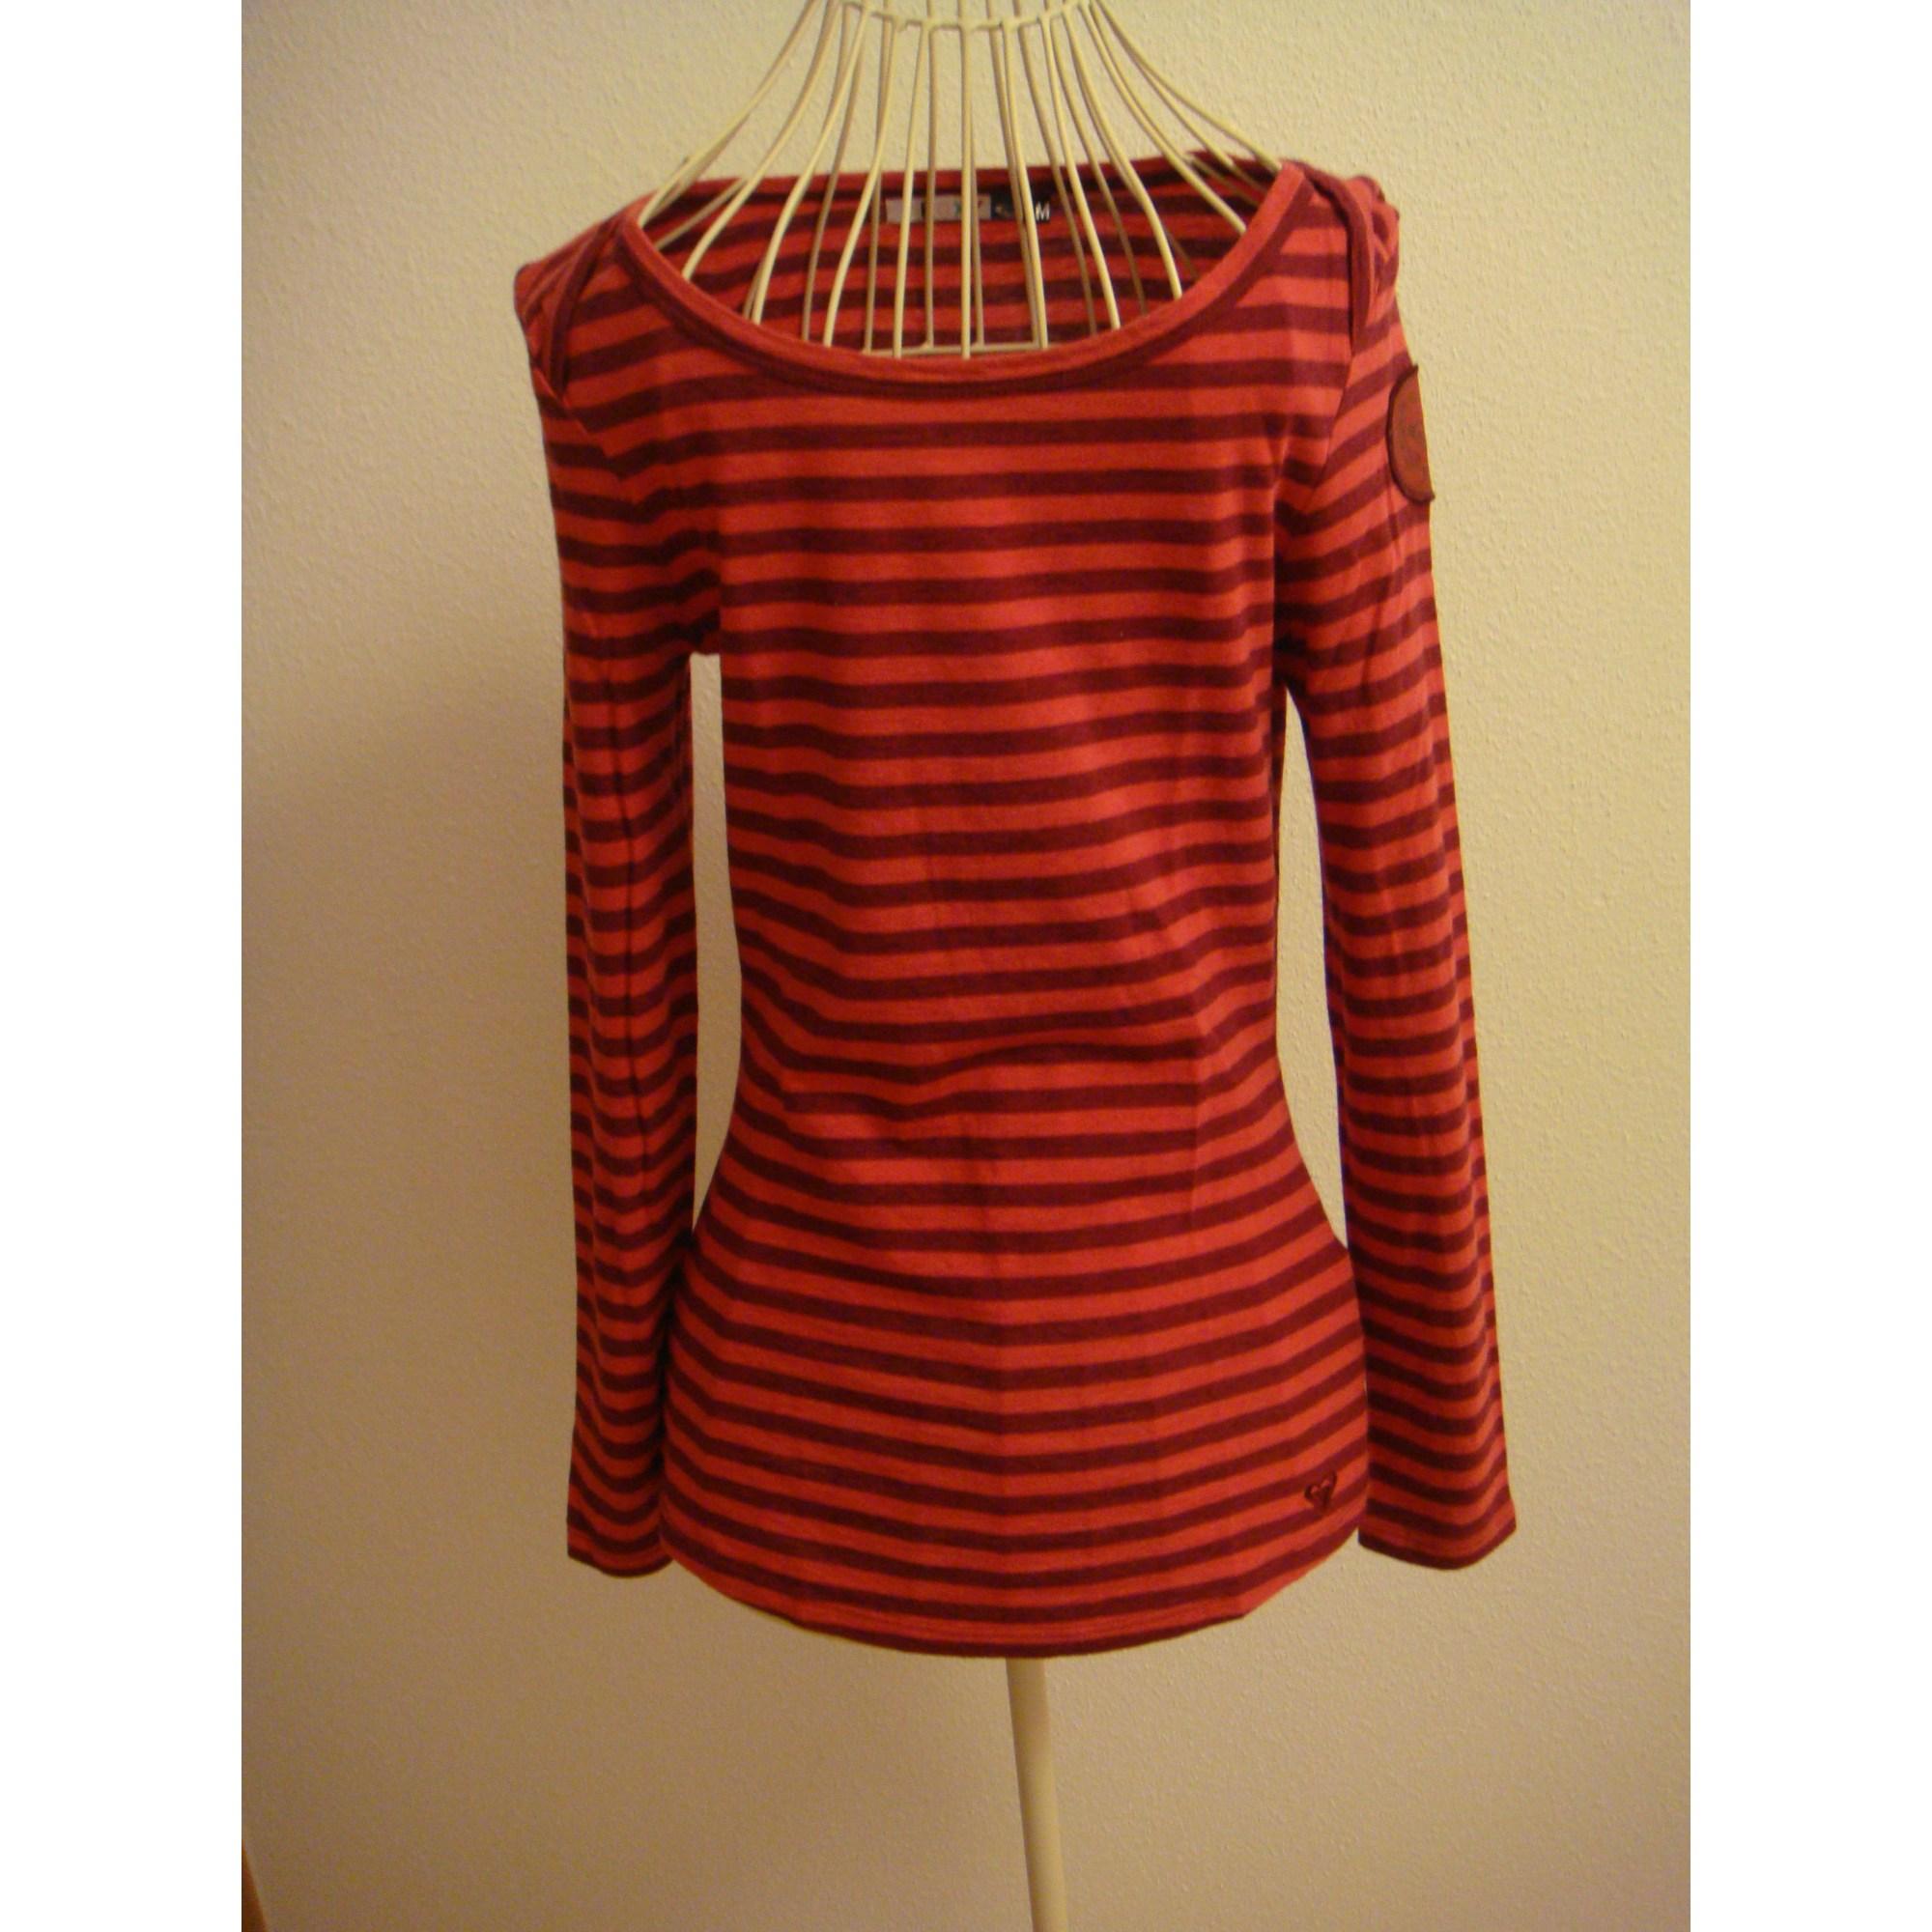 Top, tee-shirt ROXY Rouge, bordeaux